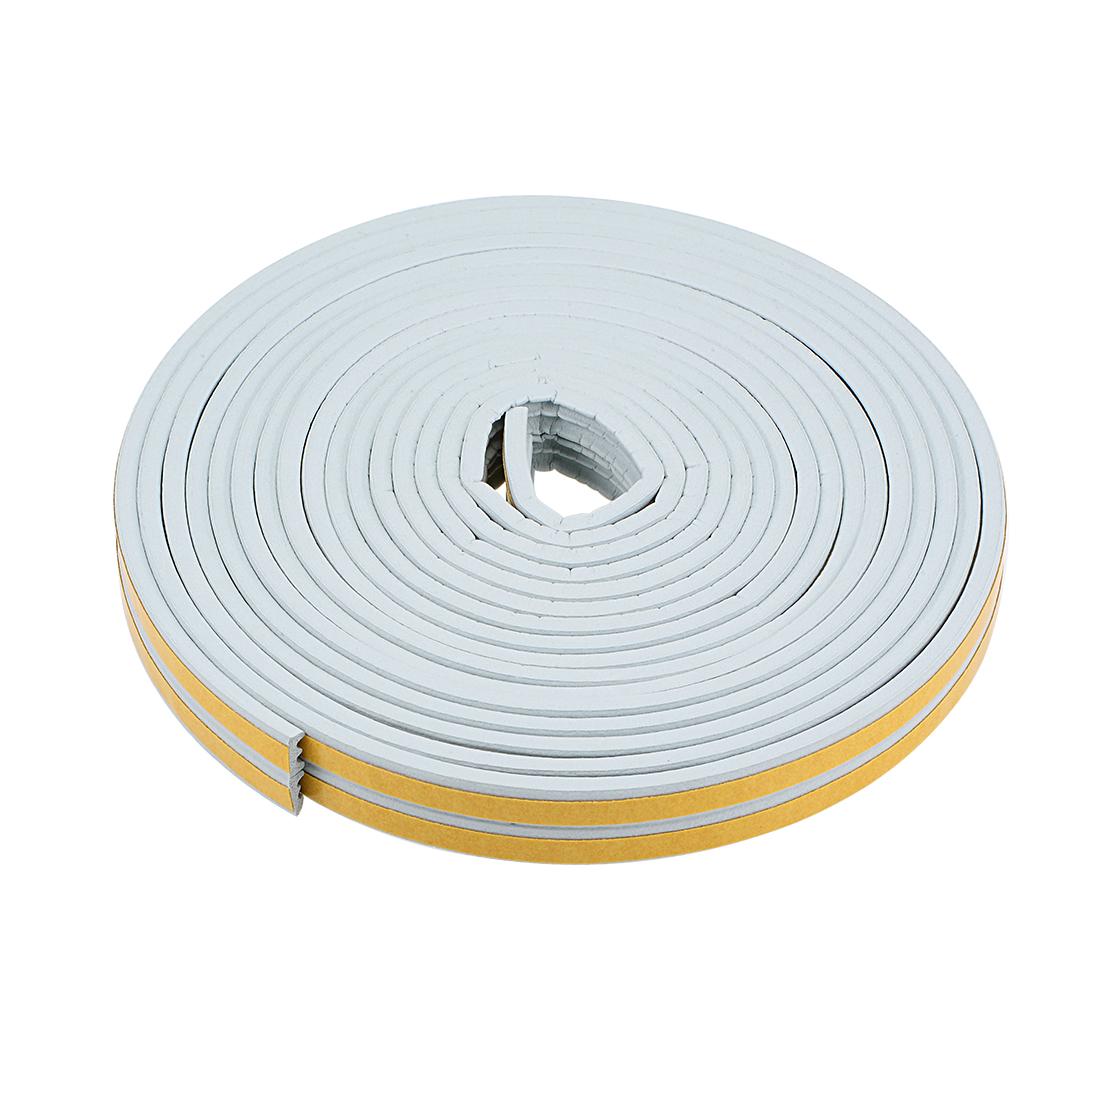 Foam Tape Adhesive 9mm Width 4mm Thick, Total 32.8 Feet Long Gray 2Pcs